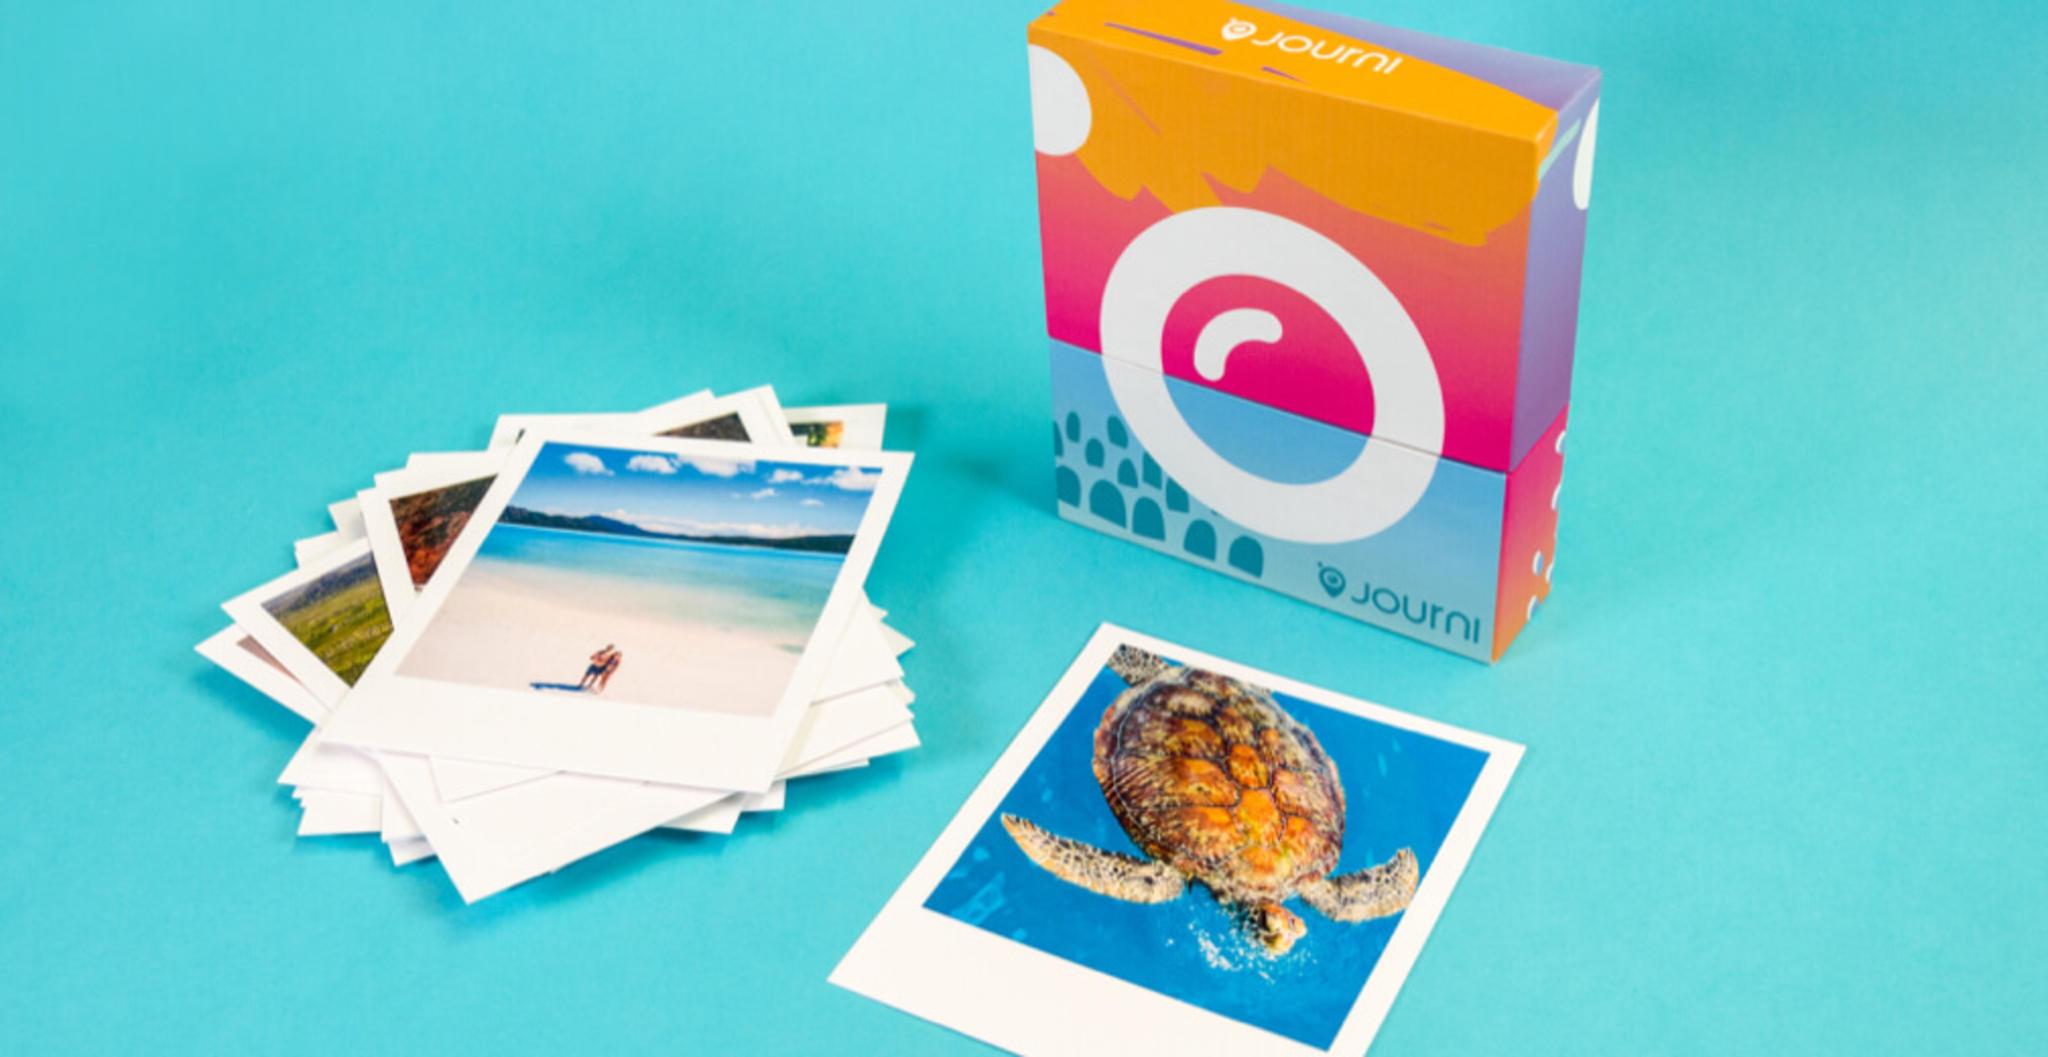 original-polaroid-box-product-image